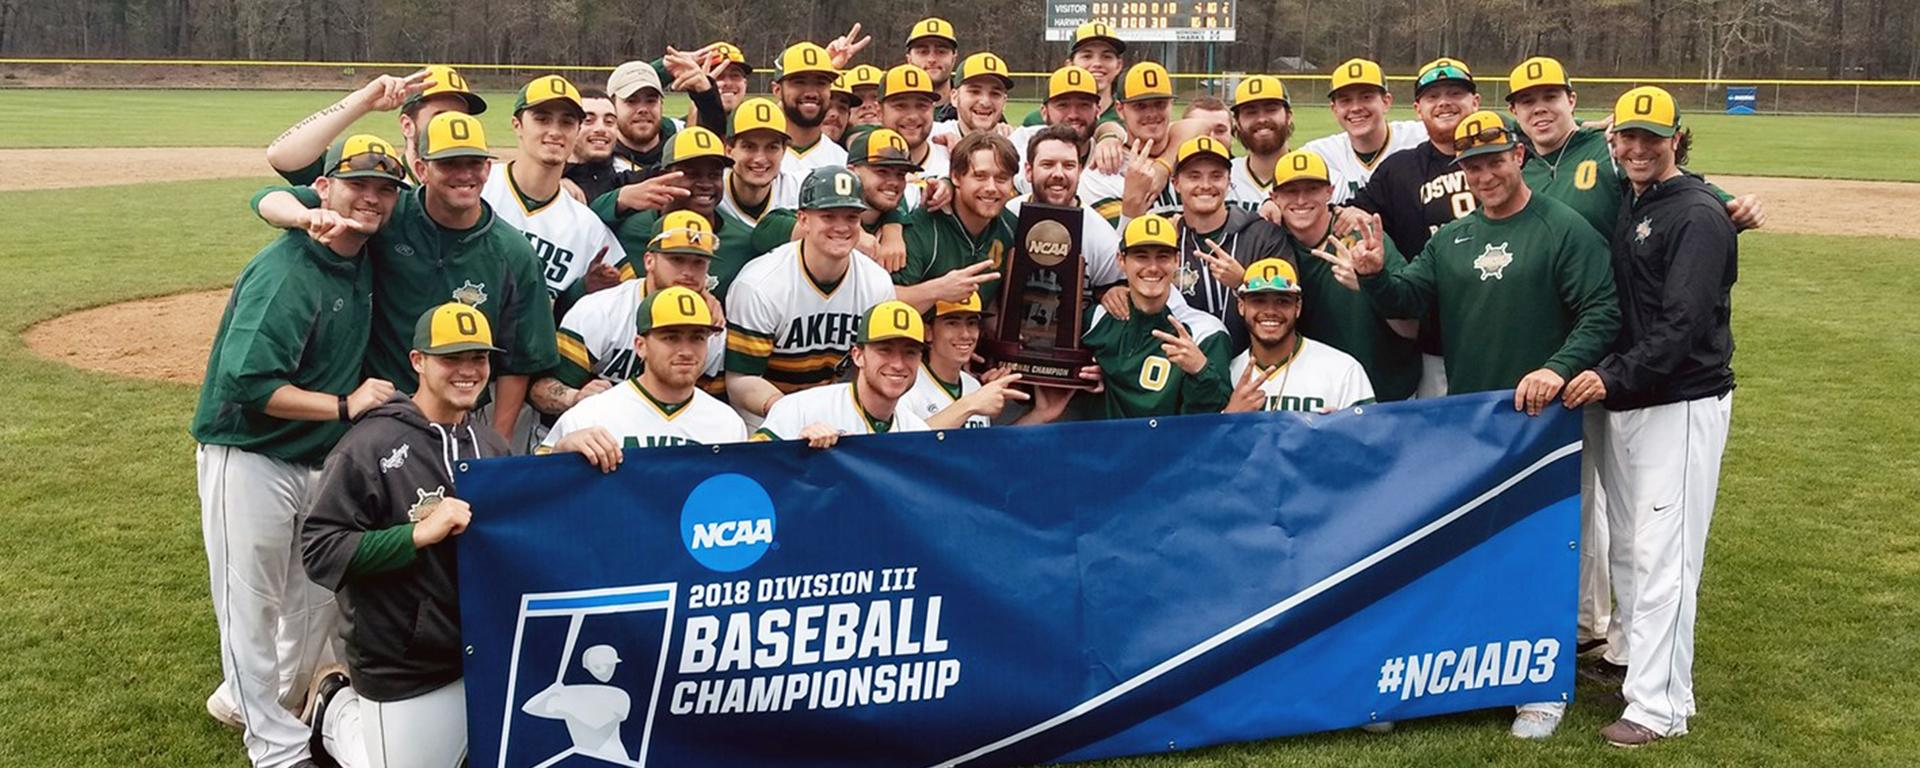 Laker baseball players celebrate winning NCAA New England Regional